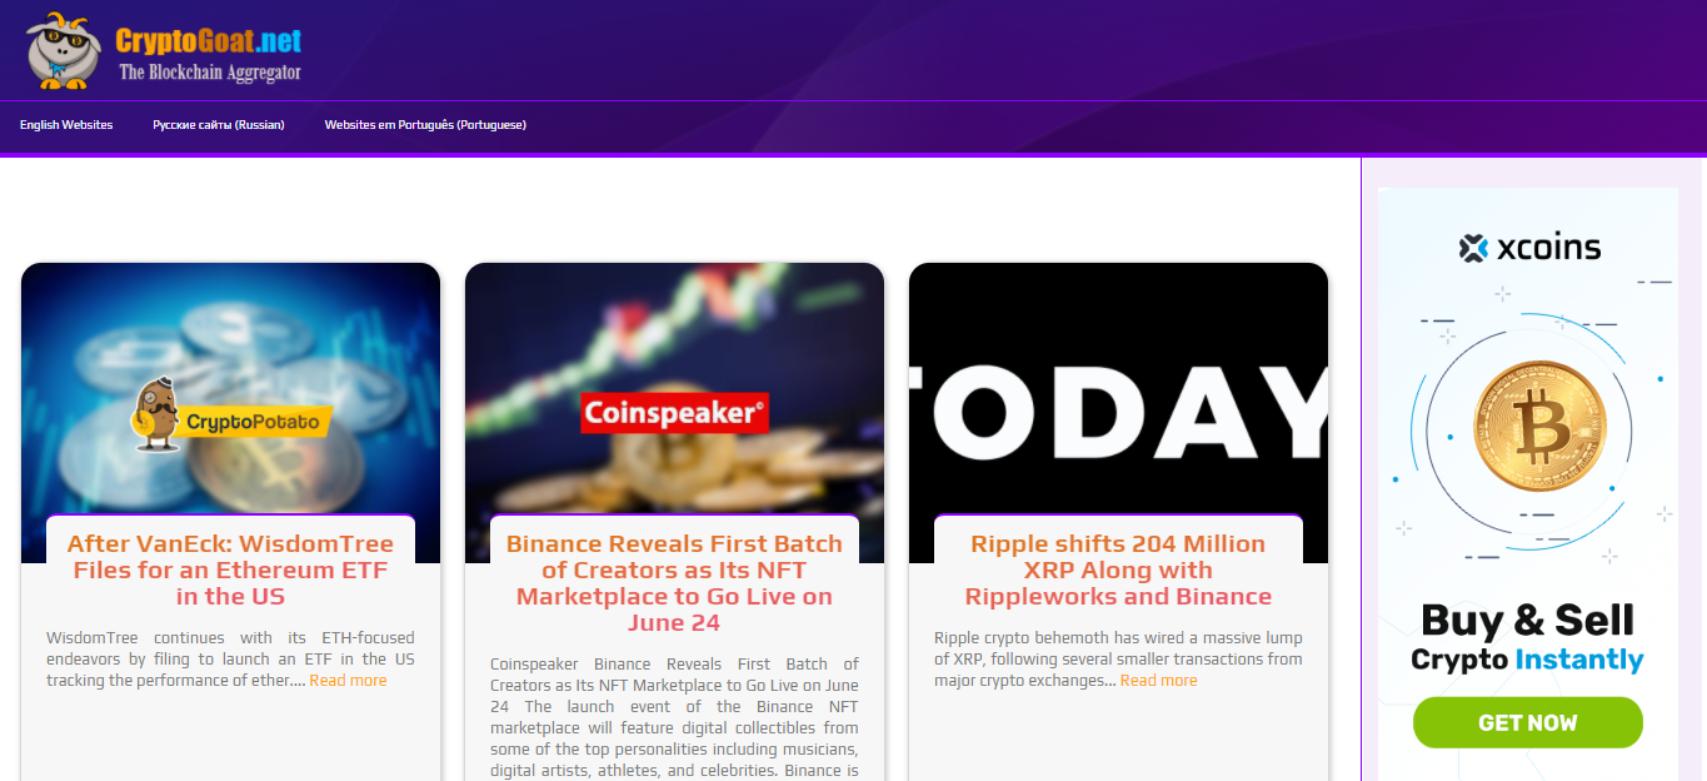 CryptoGoat website